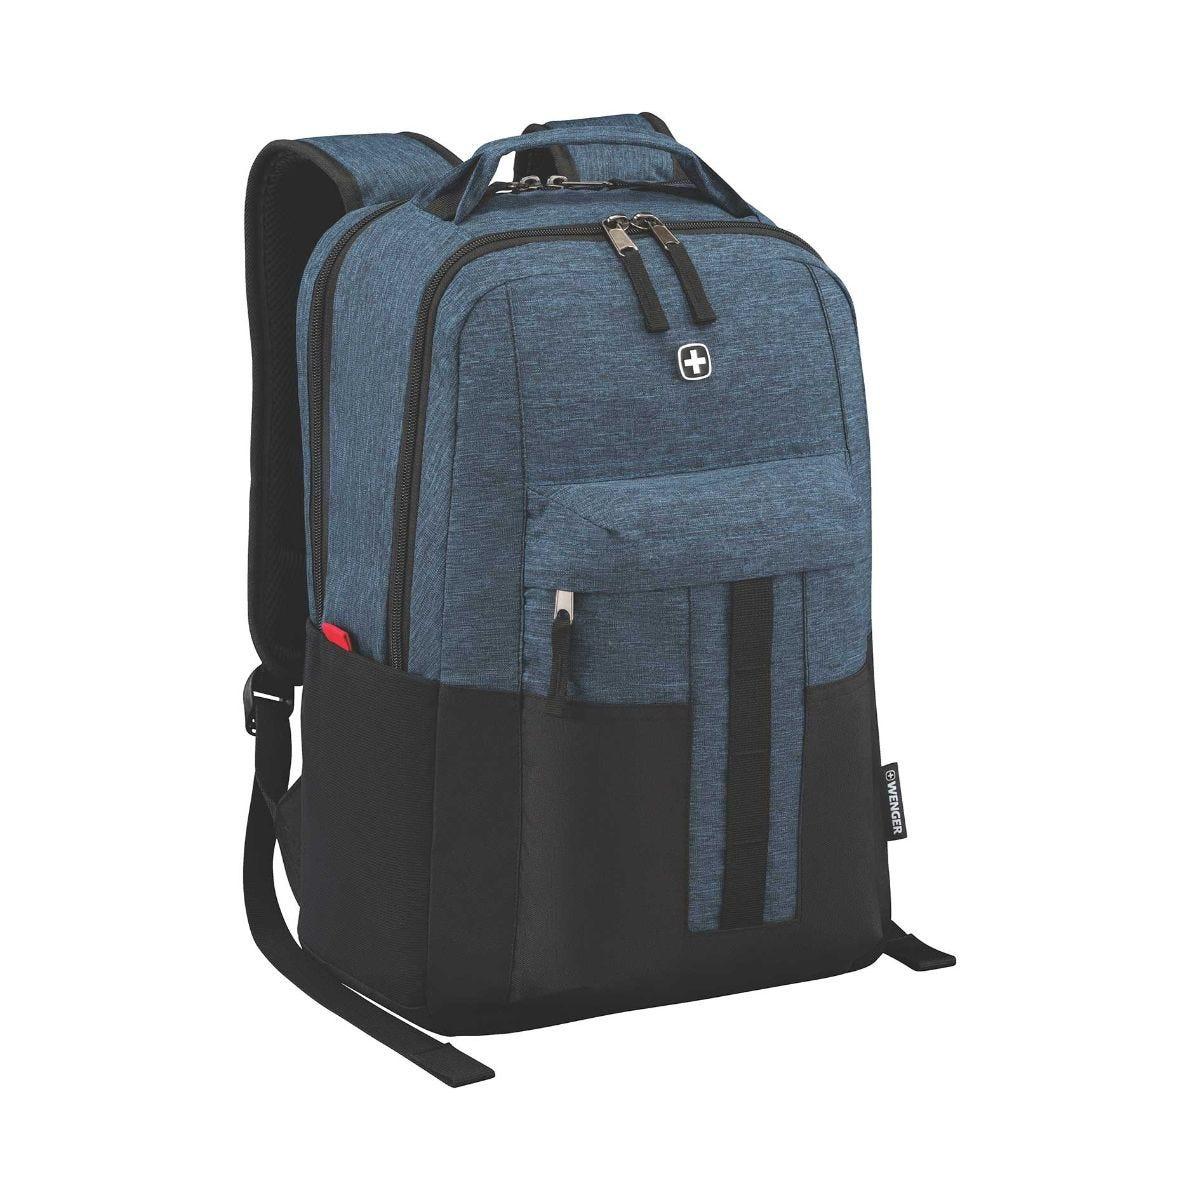 Wenger Ero 16 Inch Backpack Blue Denim, Blue Denim.